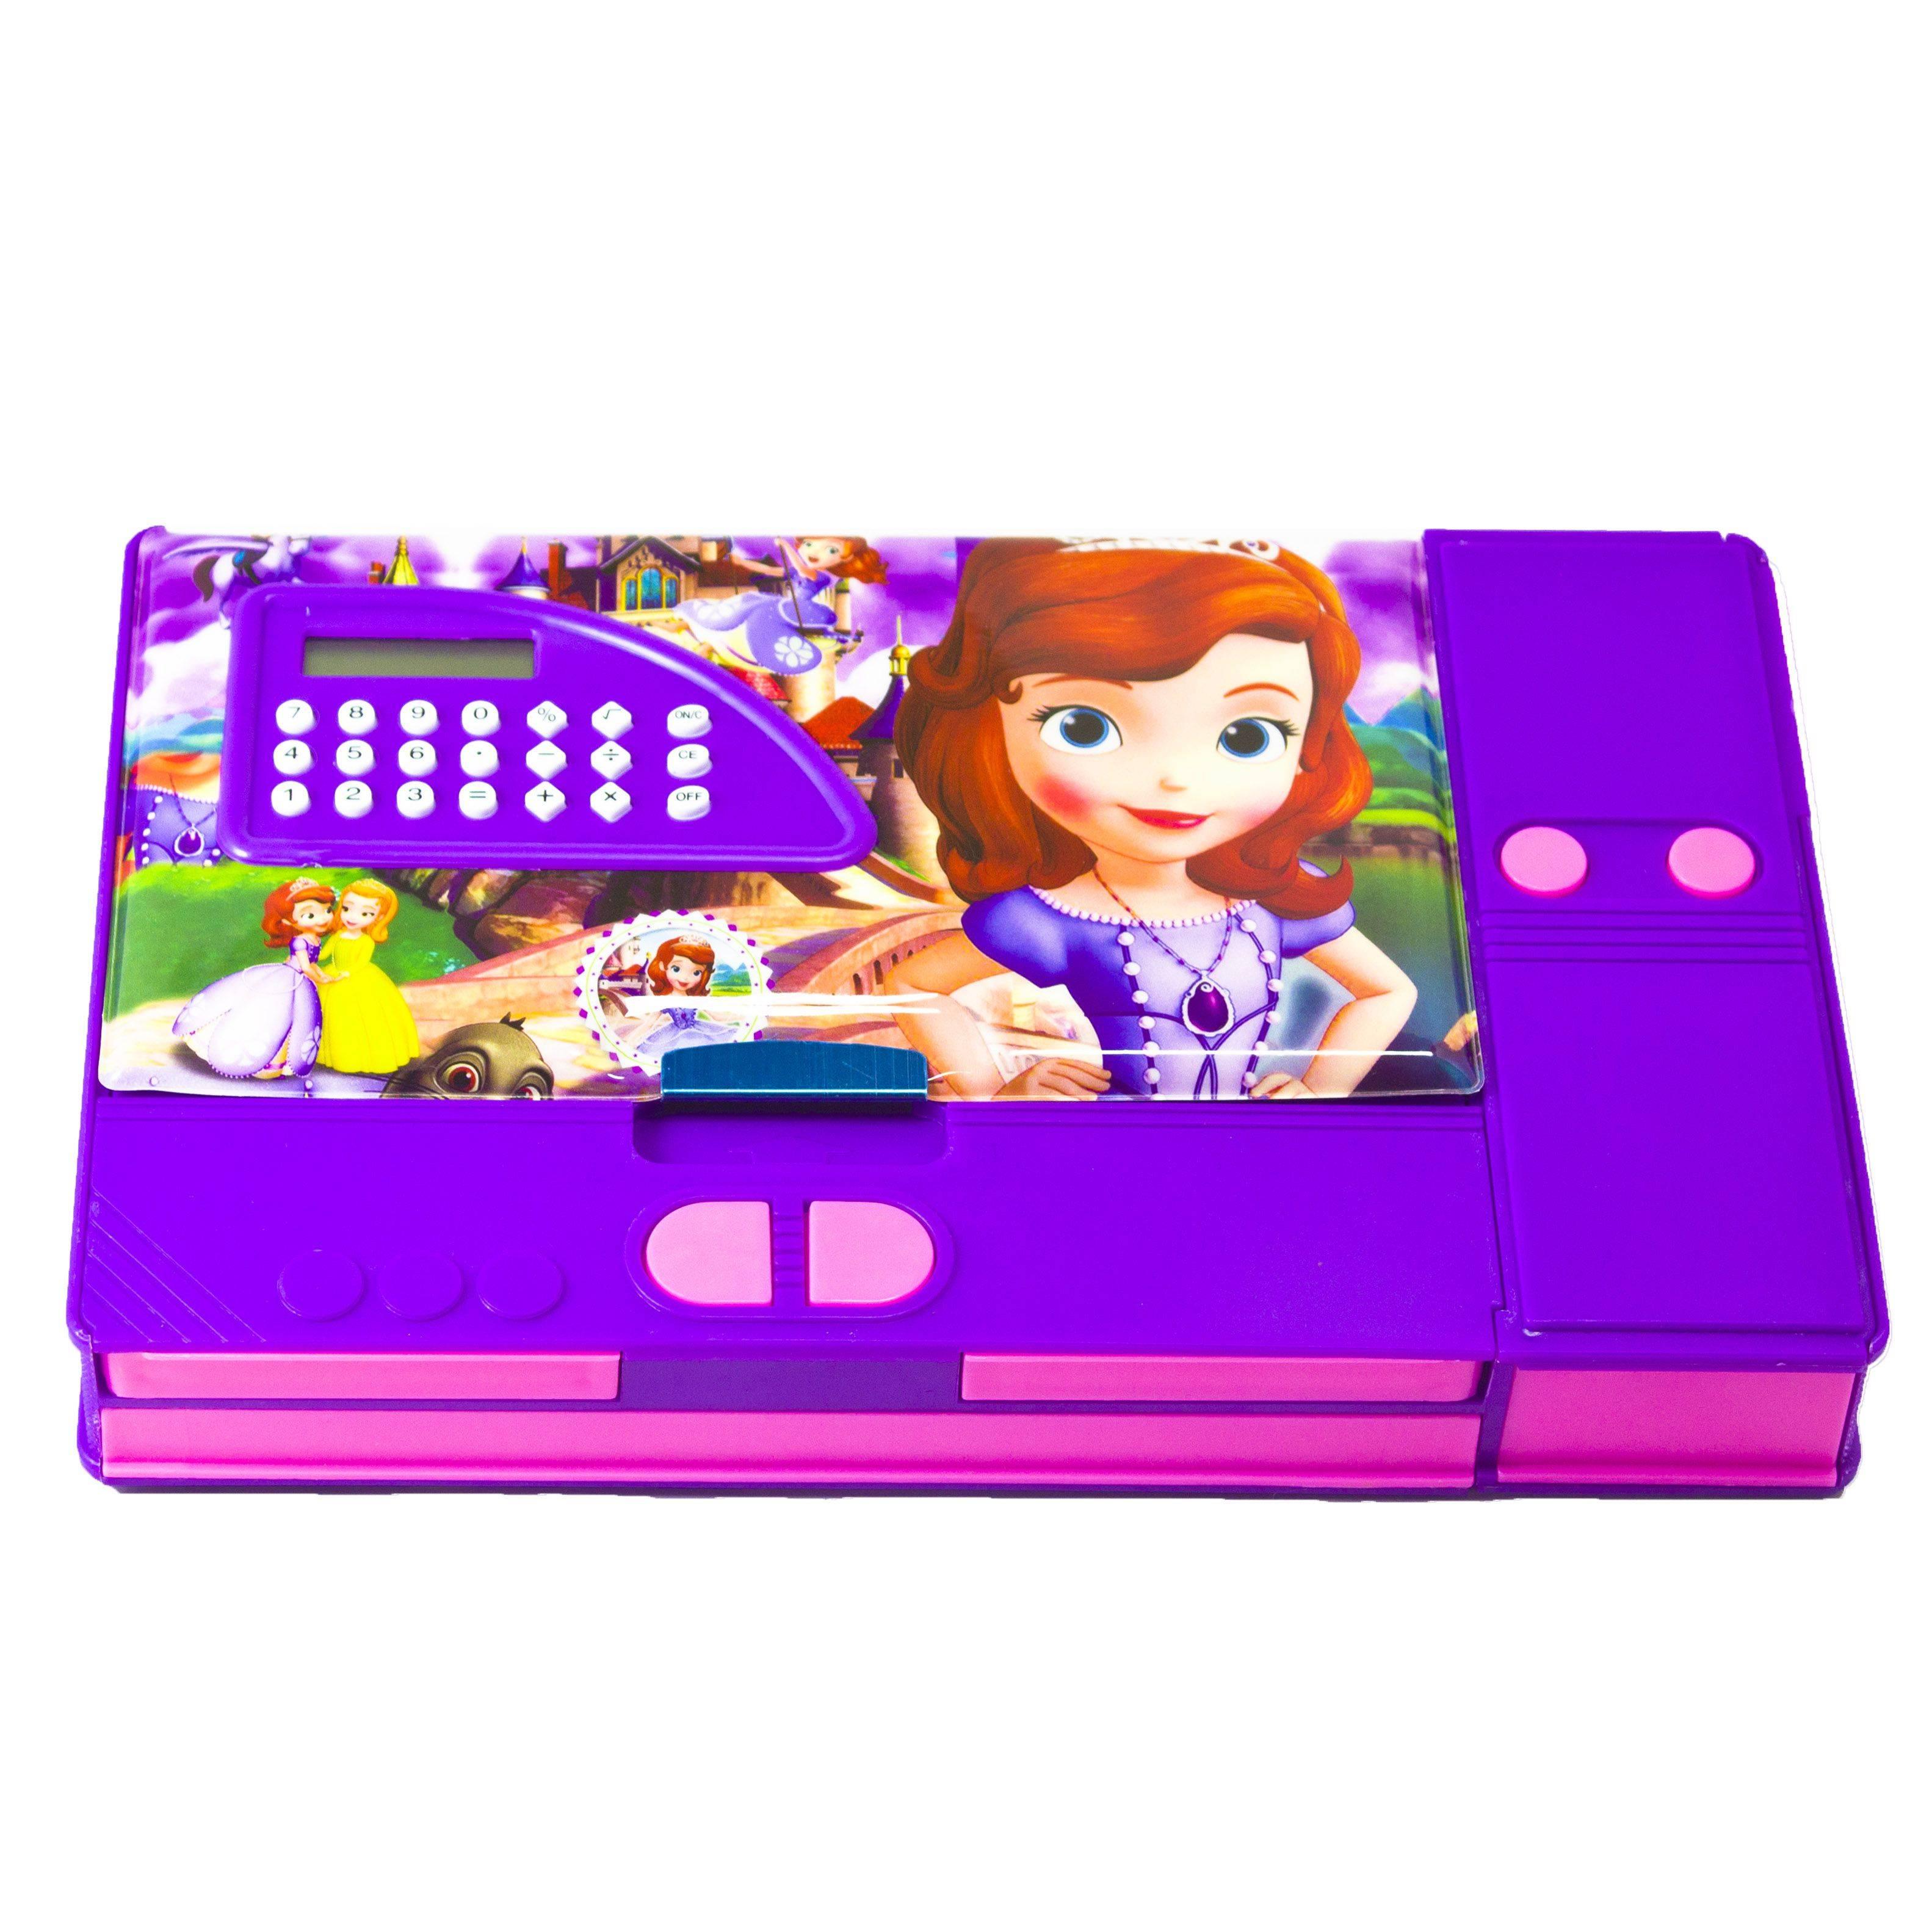 Toyvala Princess Gad Pencil Box SDL 1 88ad5